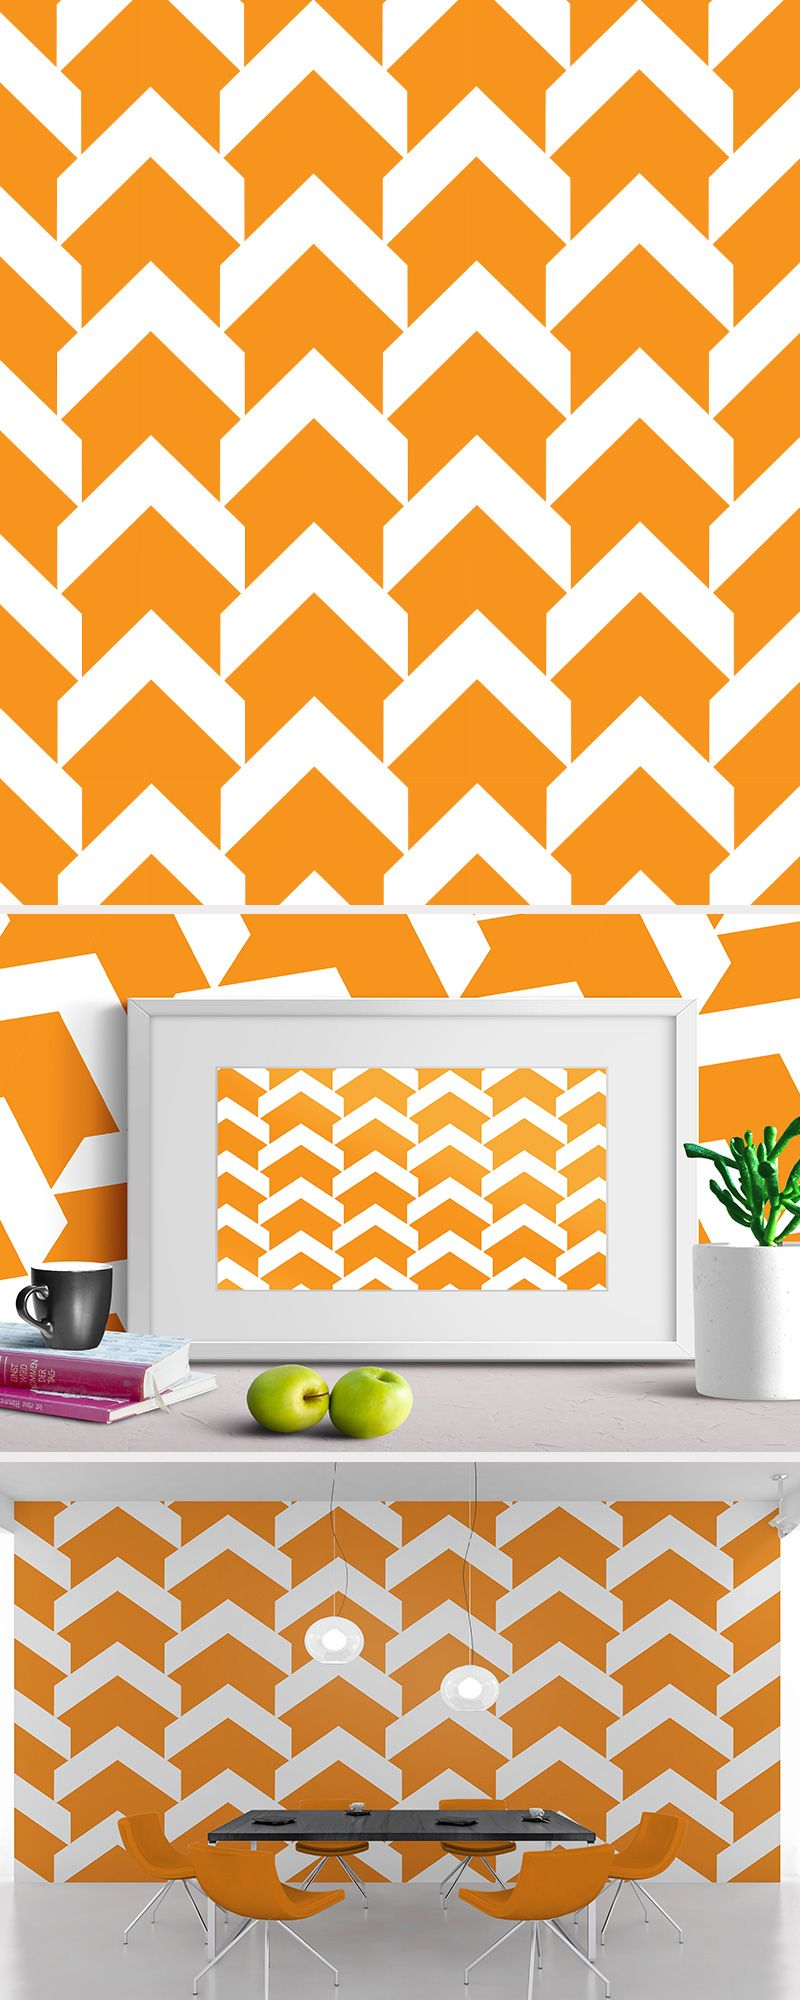 Modern orange pattern used as design for framed art and interior ...